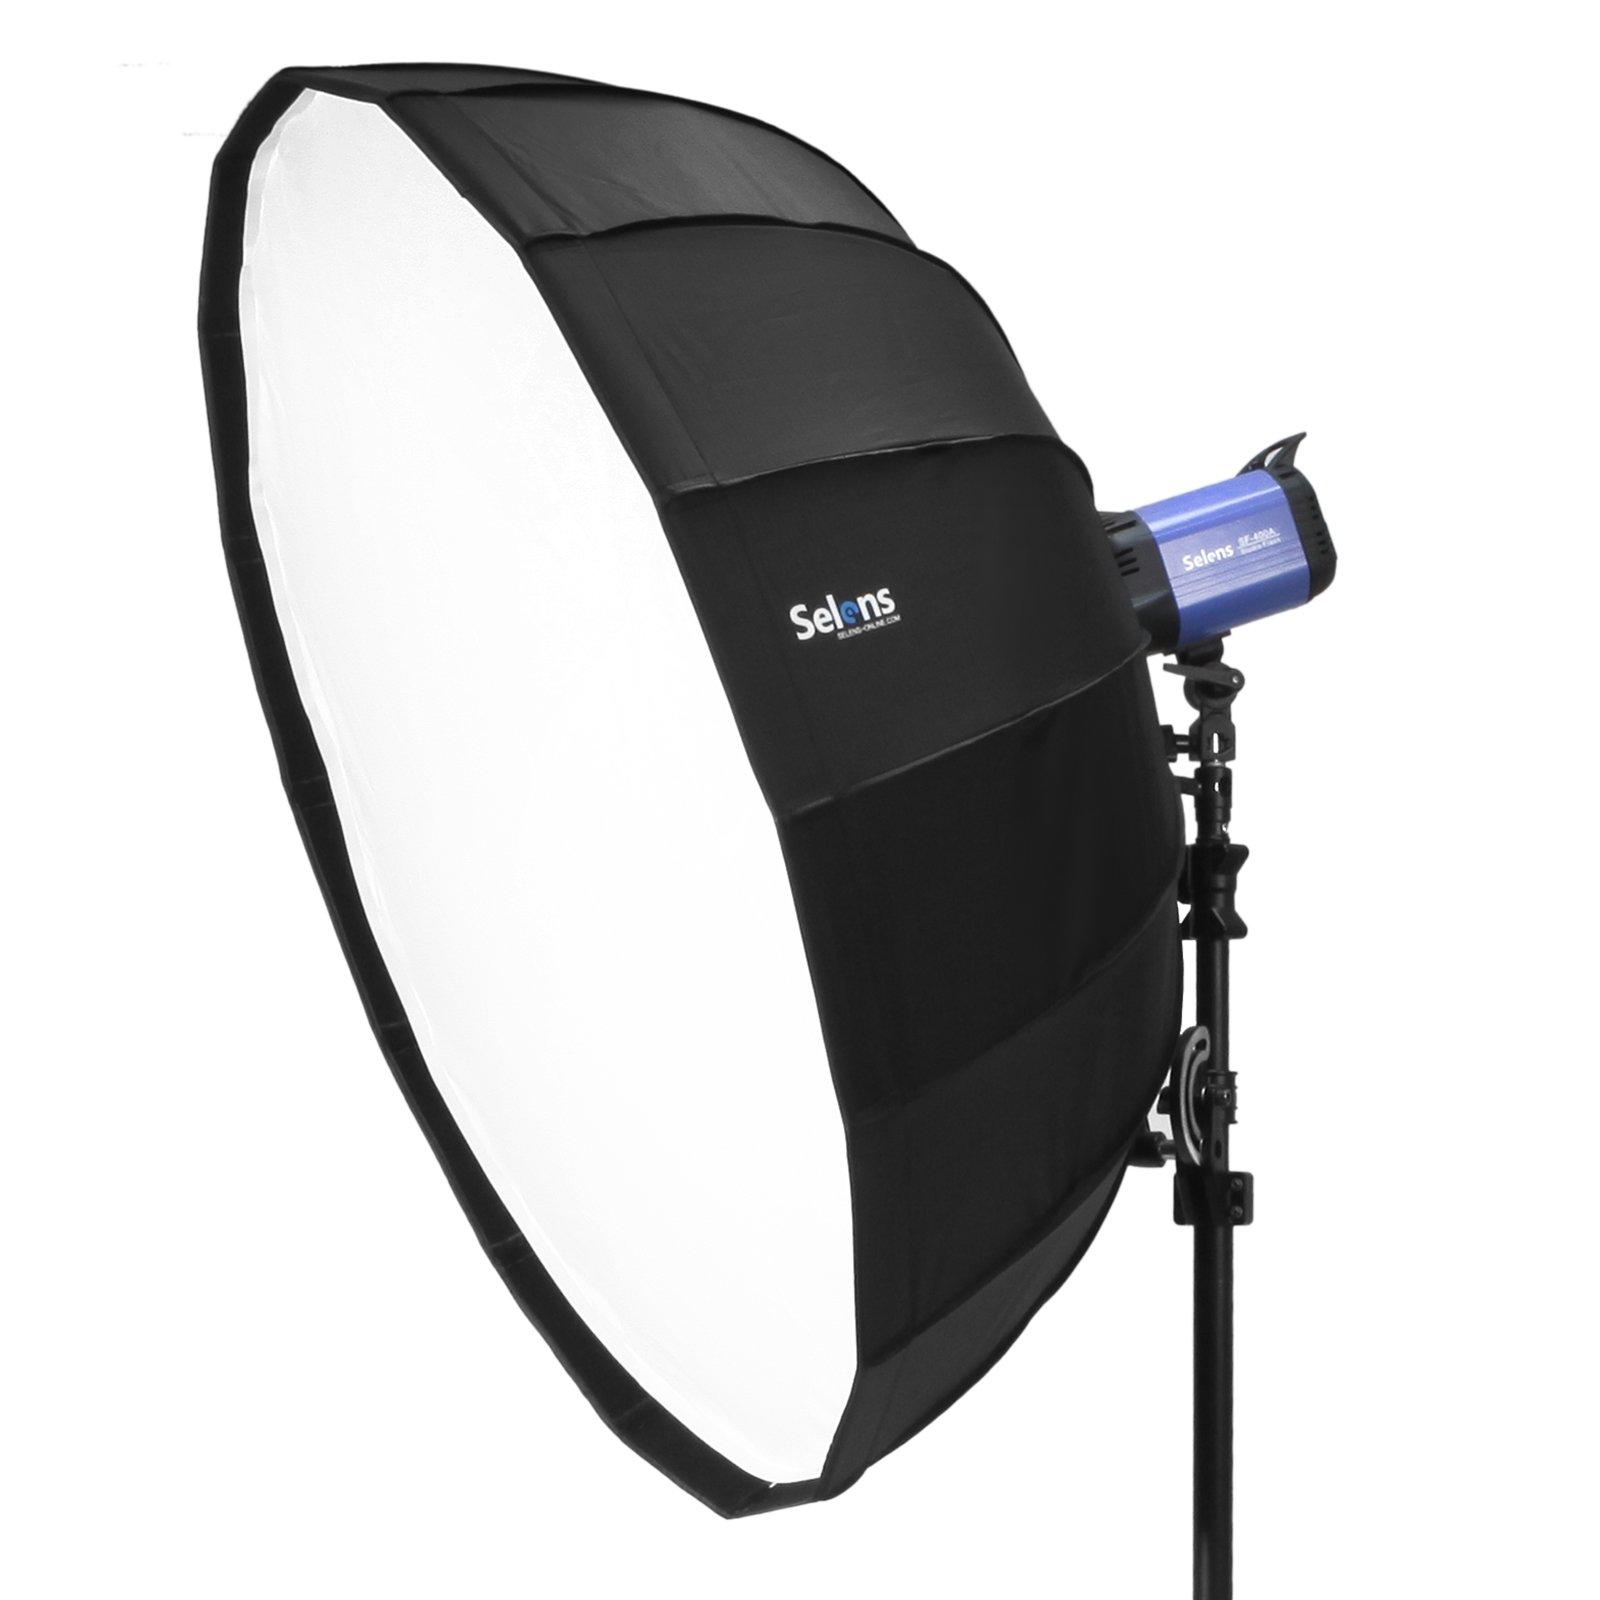 Selens 42''/105cm Hexadecagon Portable Quick Folding Speedlite, Studio Flash, Speedlight Umbrella Softbox with Bowens Speedring Mount for Photo Studio Lighting Flash Light